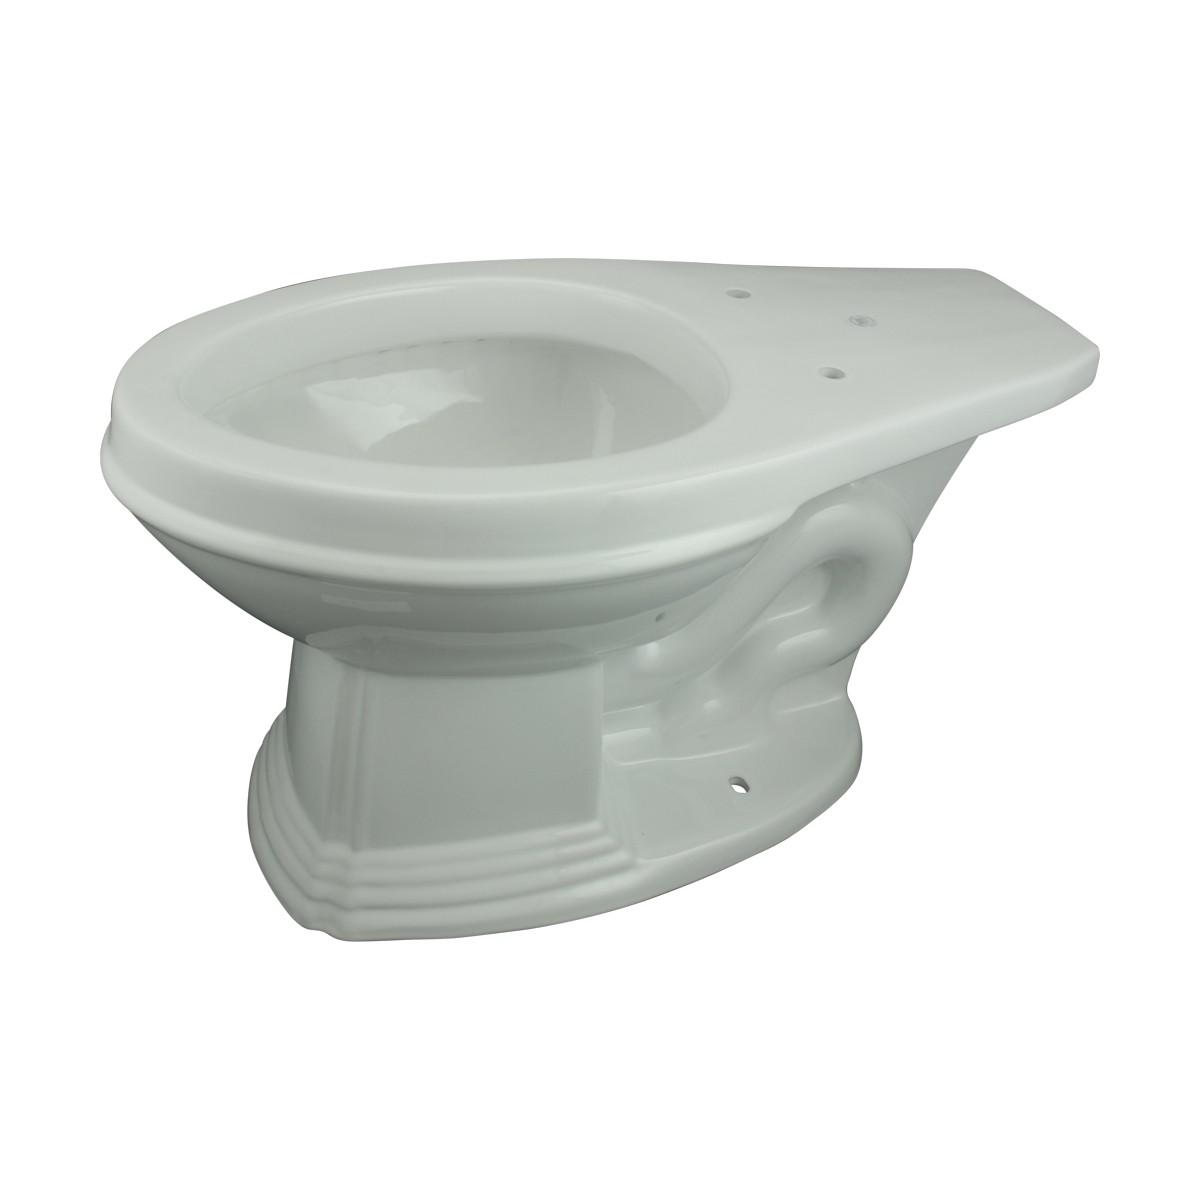 Mahogany High Tank Pull Chain Toilet With White Elongated Toilet Bowl High Tank Pull Chain Toilets High Tank Toilet with Elongated Bowl Old Fashioned Toilet